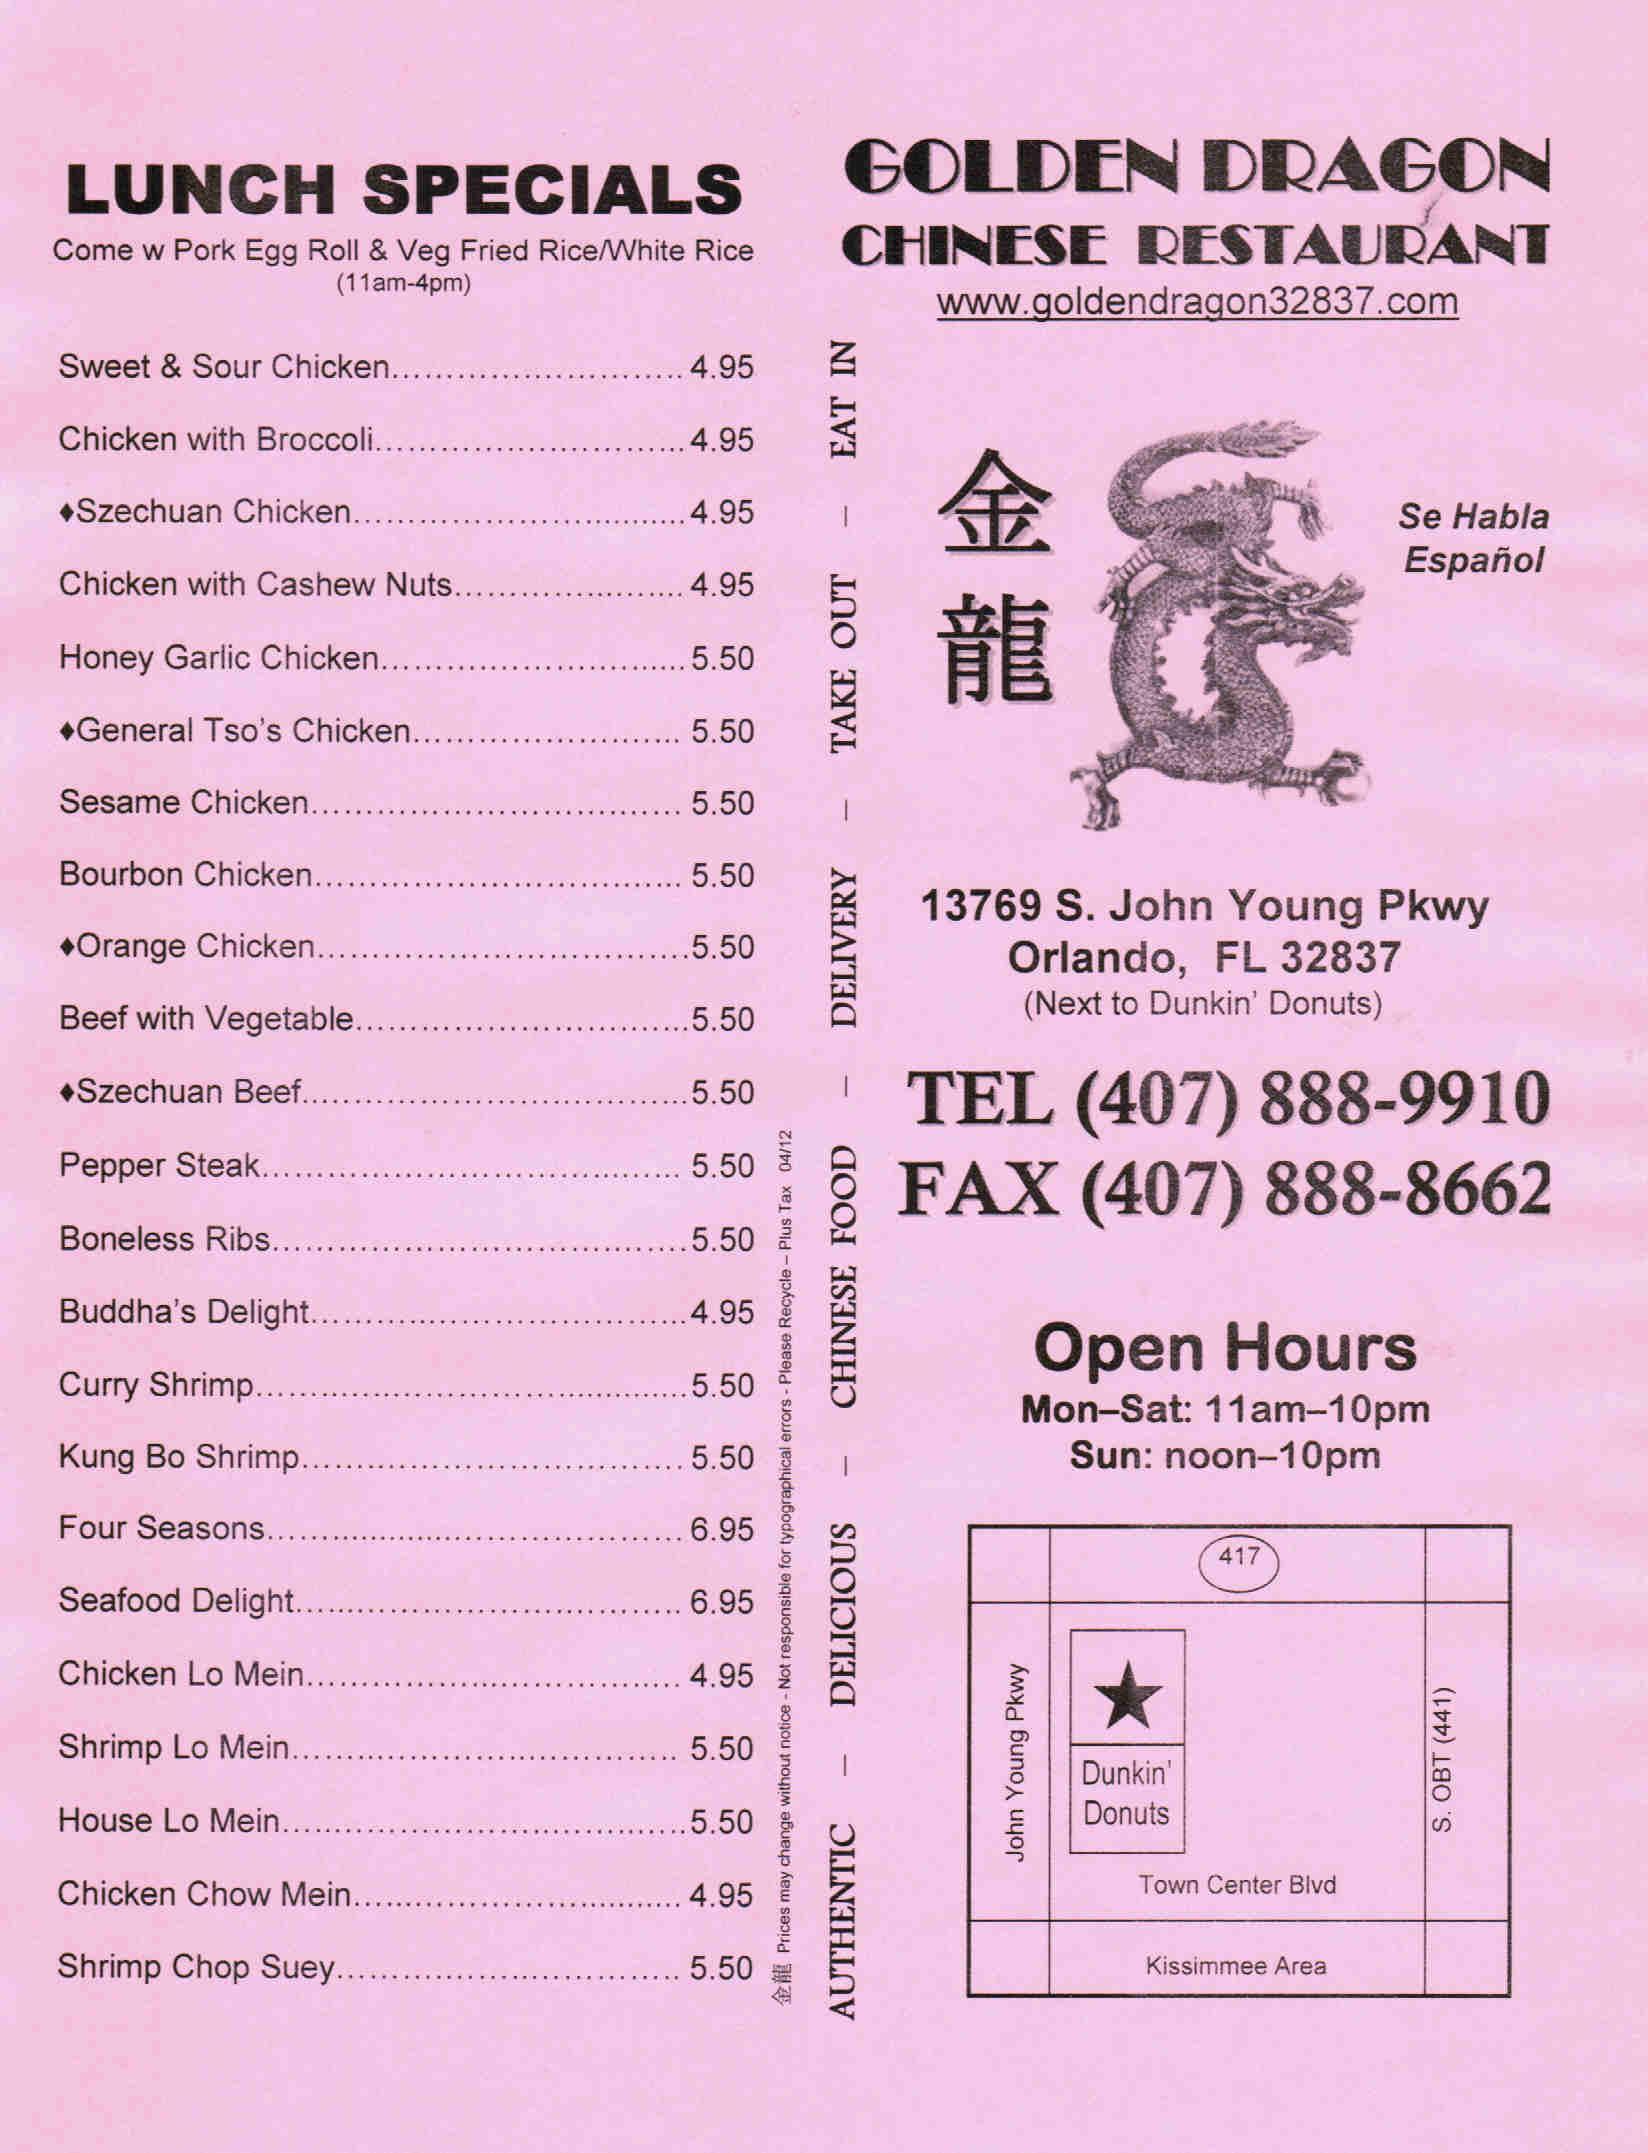 Golden Dragon Chinese Food Restaurant Orlando Fl Takeout